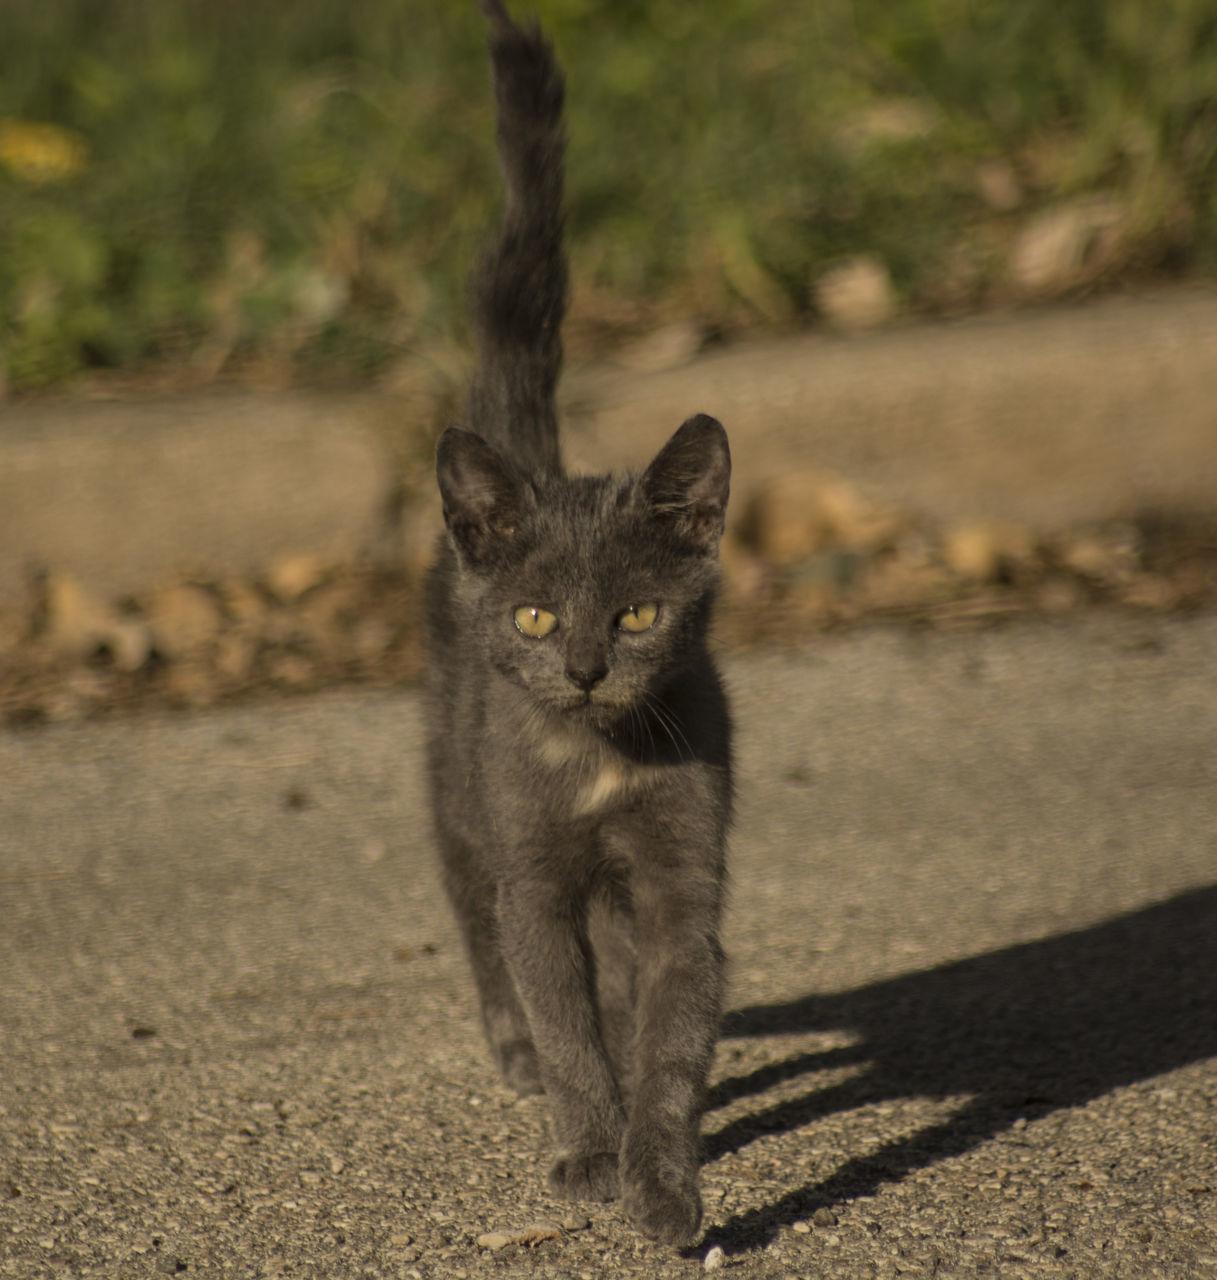 Portrait Of Gray Cat On Road